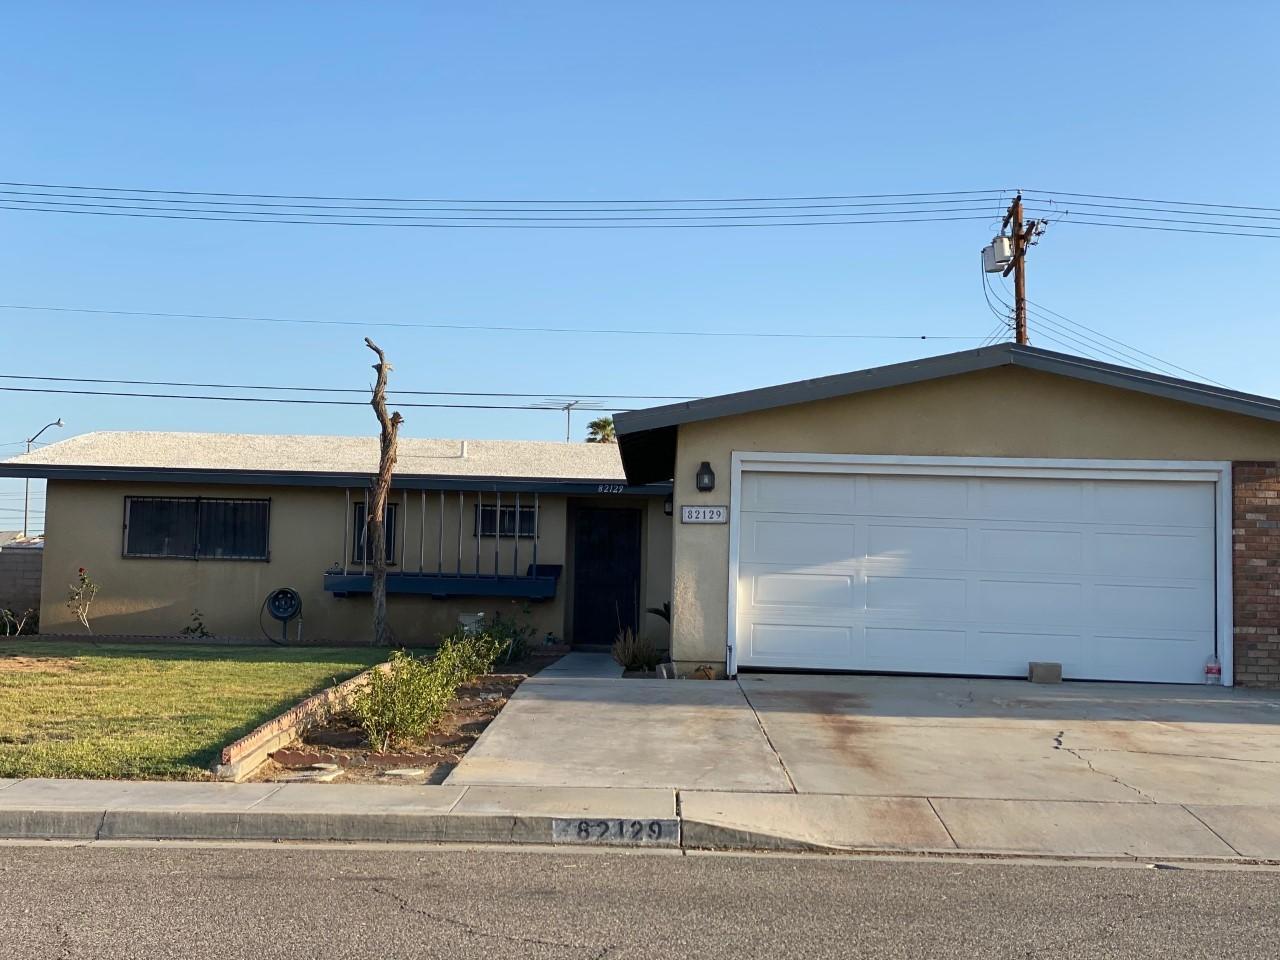 82129 Lemon Grove Avenue, Indio, California 92201, 4 Bedrooms Bedrooms, ,2 BathroomsBathrooms,Single Family,For Sale,82129 Lemon Grove Avenue,219060777